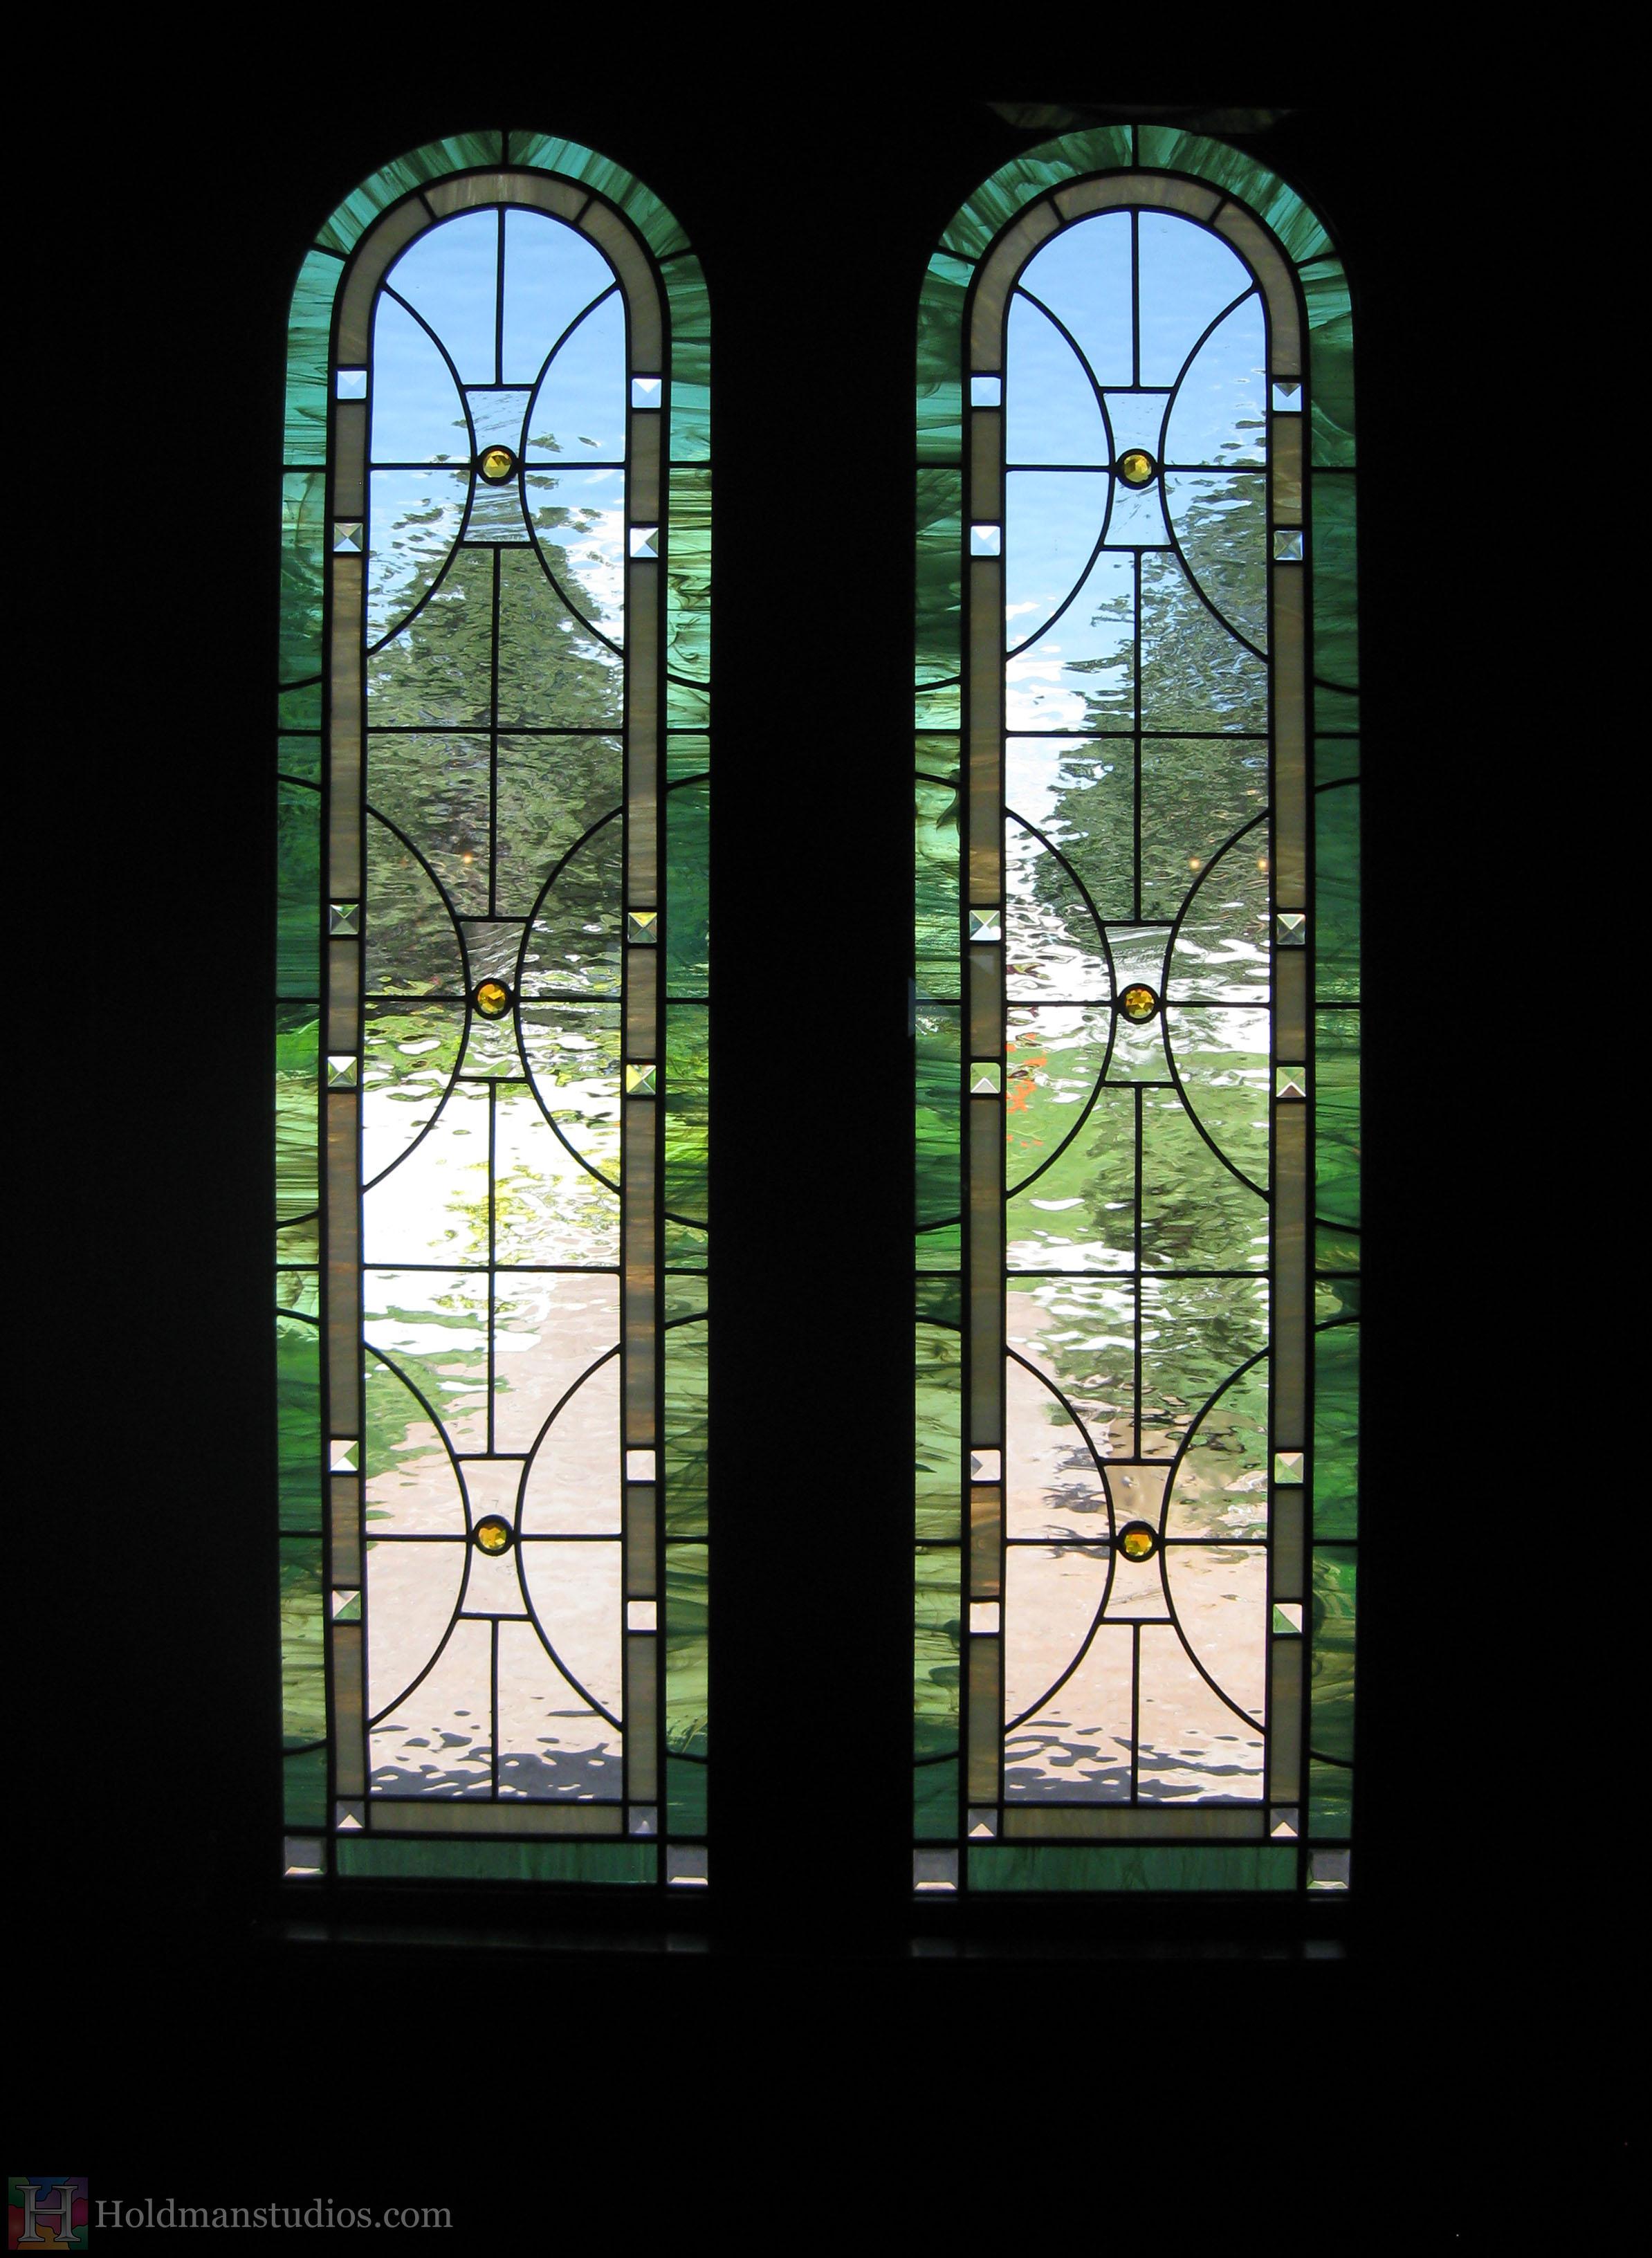 Holdman-studios-stained-glass-front-door-windows-utah-valley-university-alumni-house.jpg